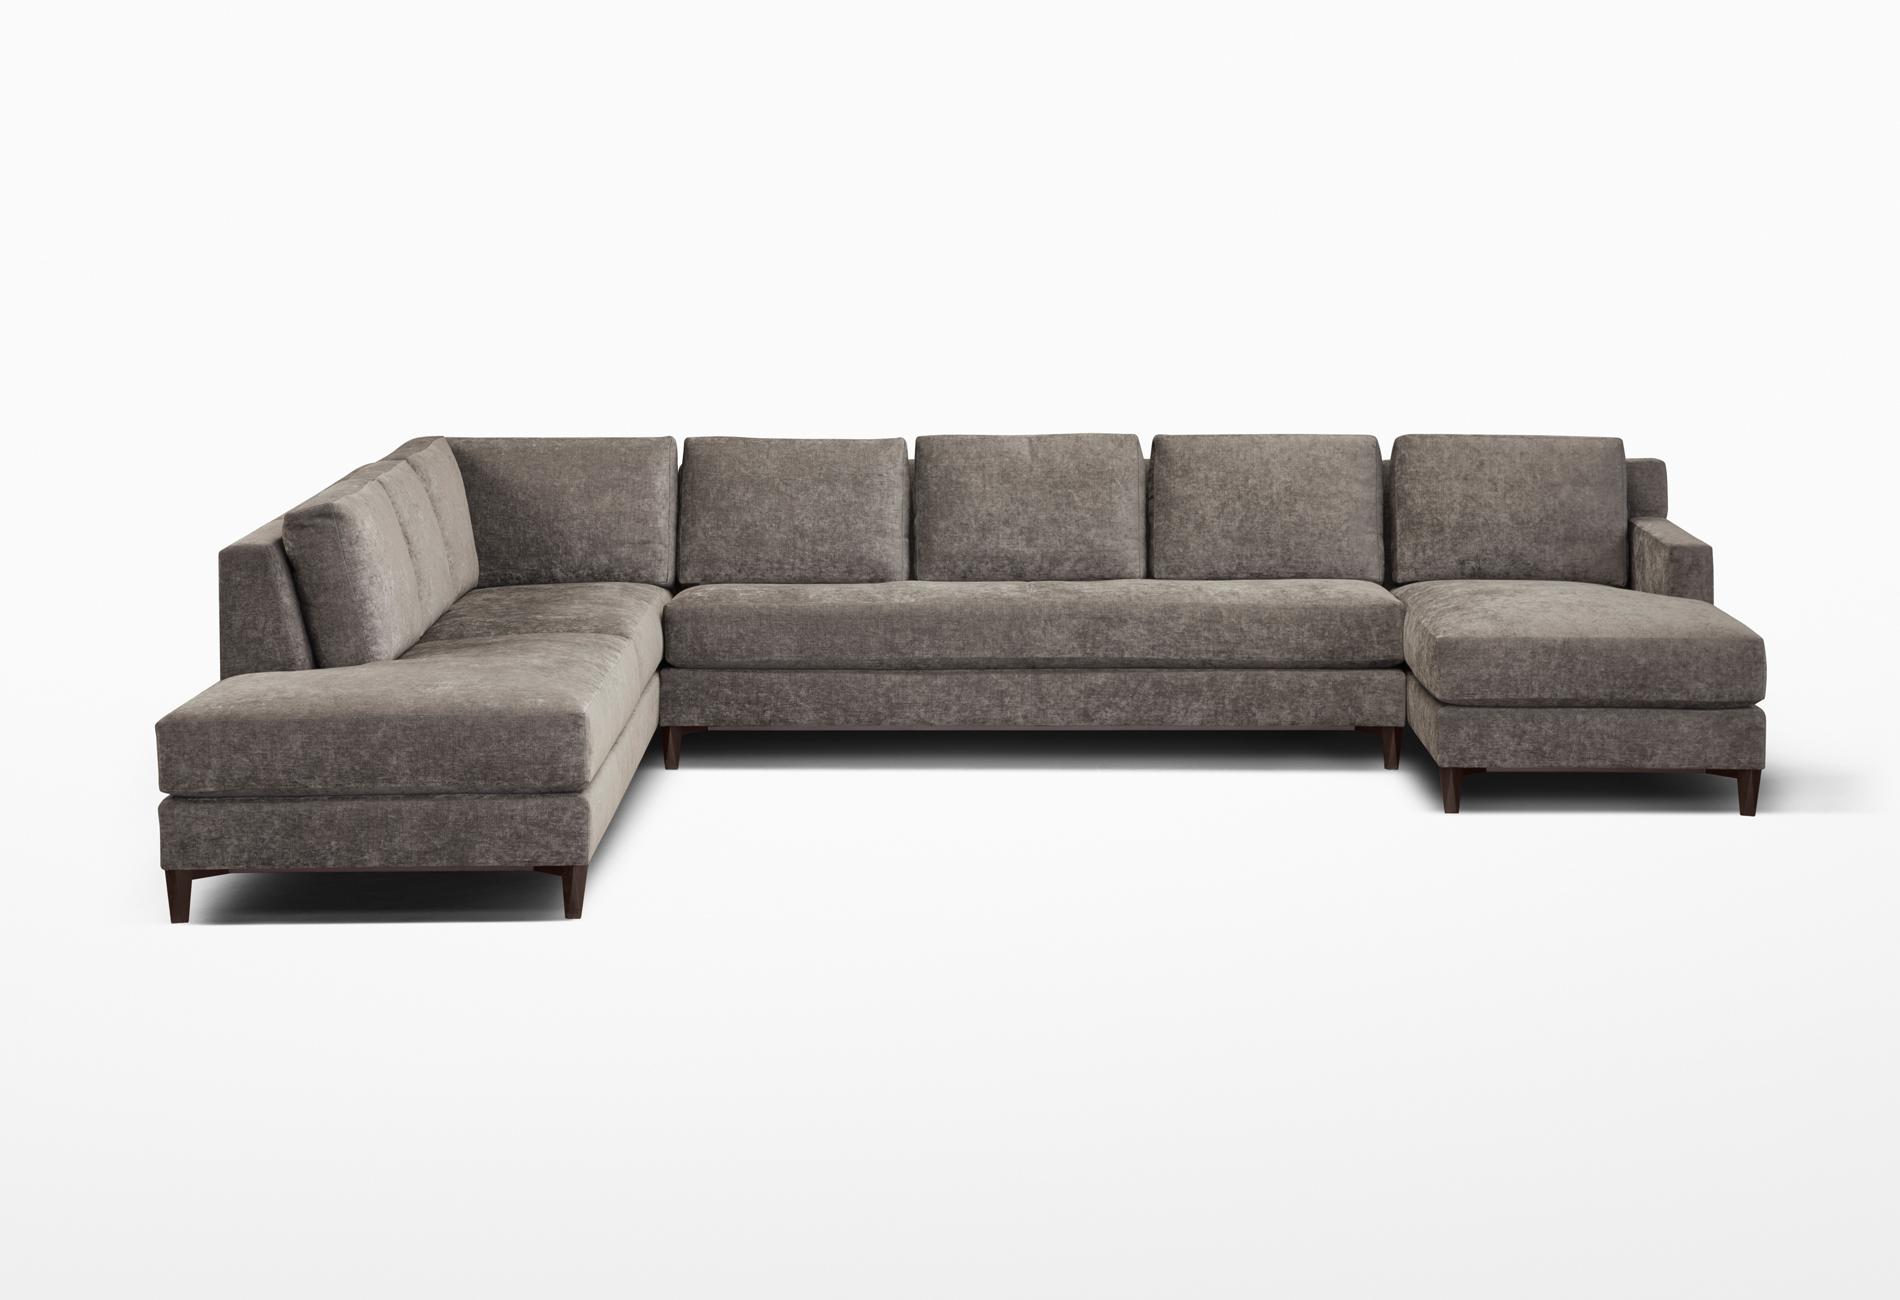 custom sectional sofa leather repair san jose 003 chai ming studios cms 1 jpg